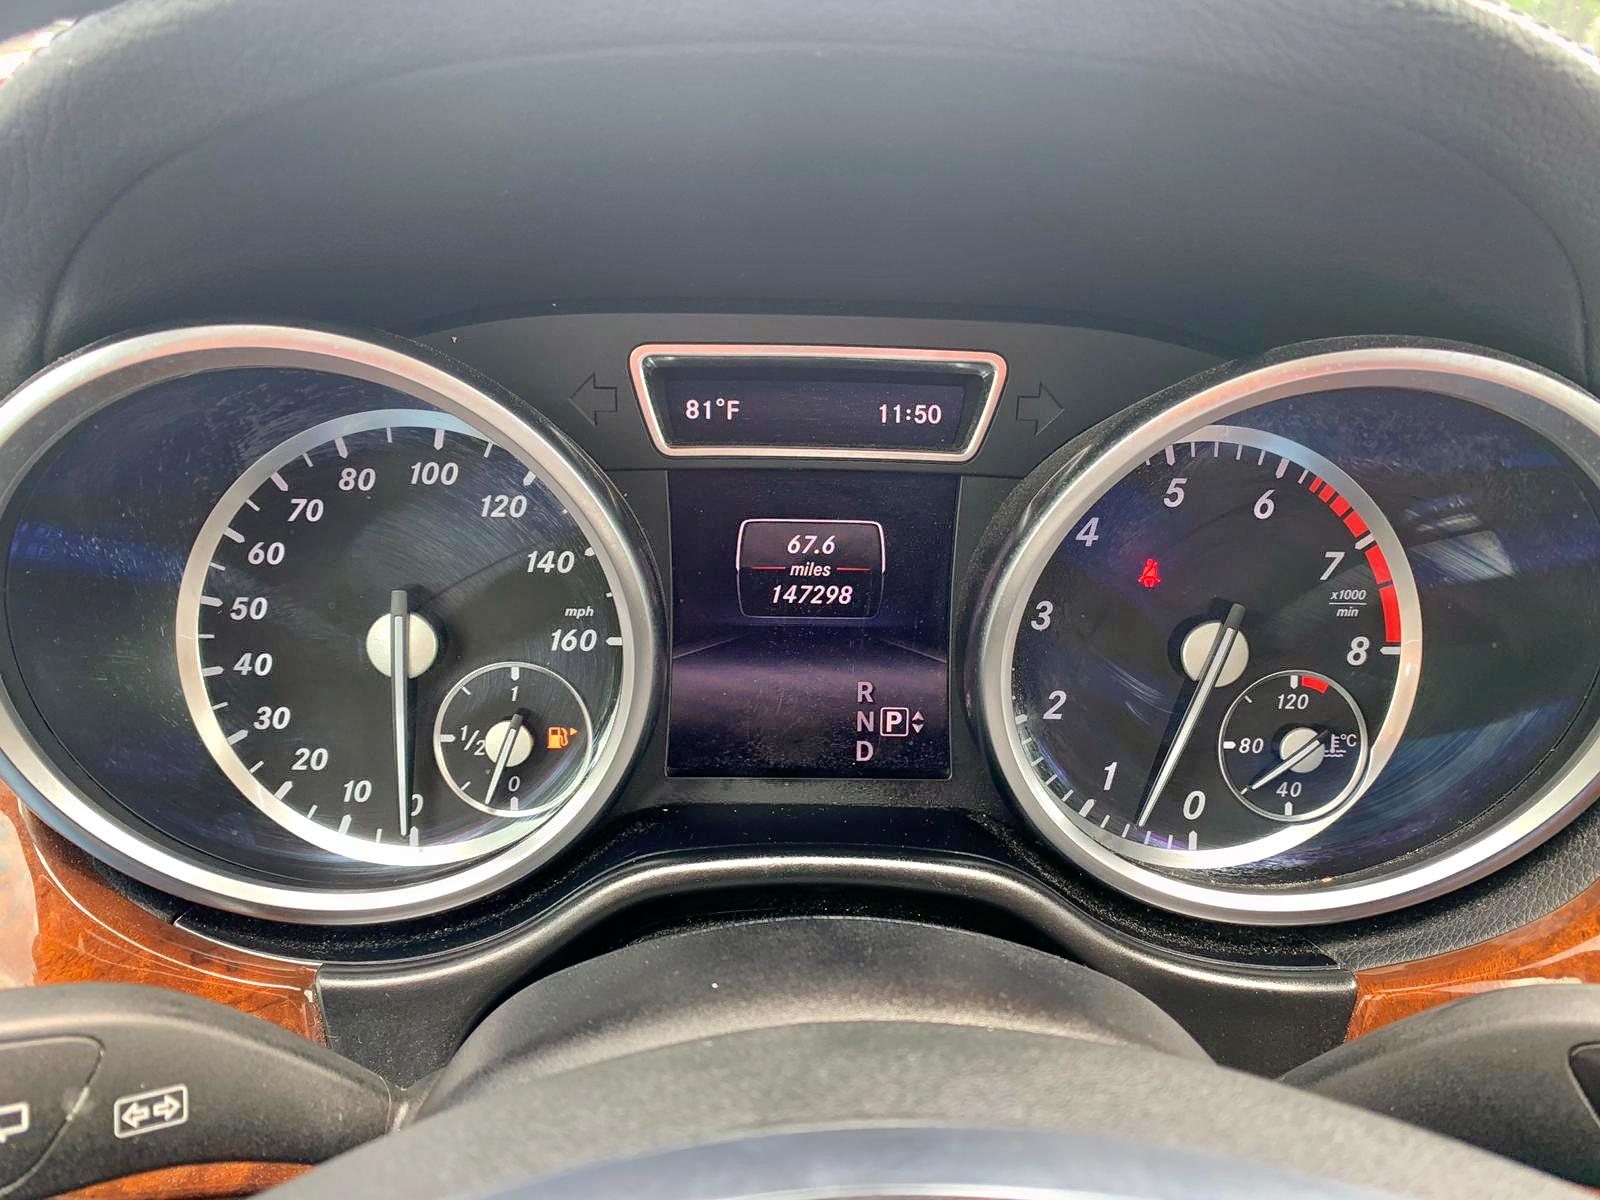 4JGDF7CE5EA308763 - 2014 Mercedes-Benz Gl 450 4Ma 4.6L inside view